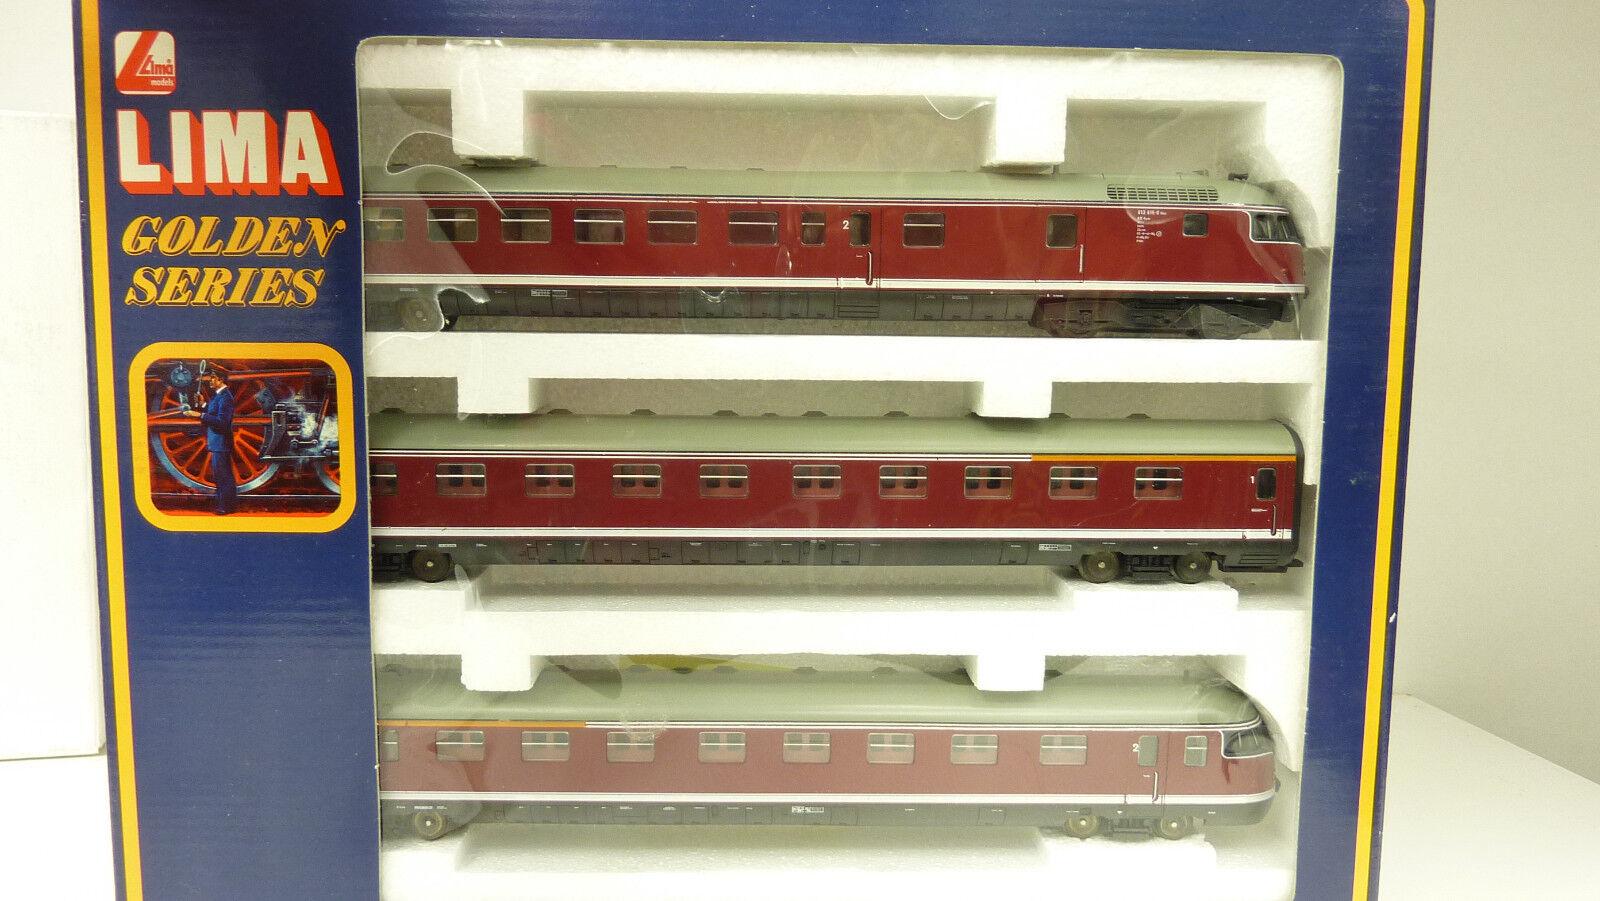 LIMA h0 149808 triebwagenzug 3tlg. br 613 uova testa DB ben tenuto in scatola originale (lz7555)